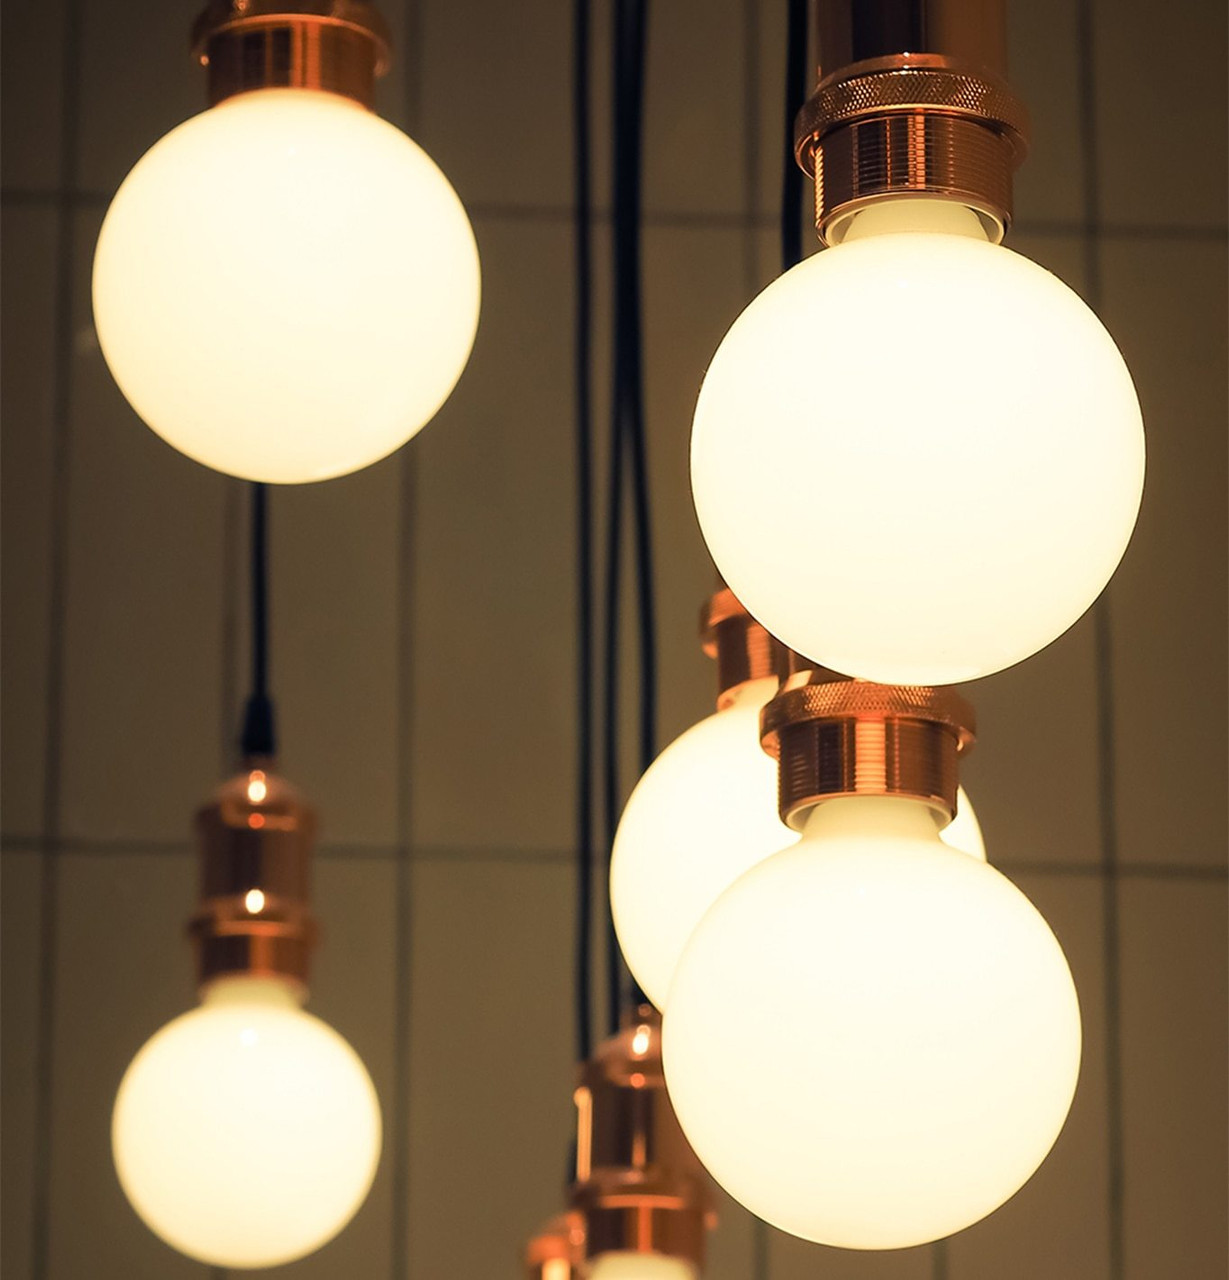 LED G95 ES Light Bulbs